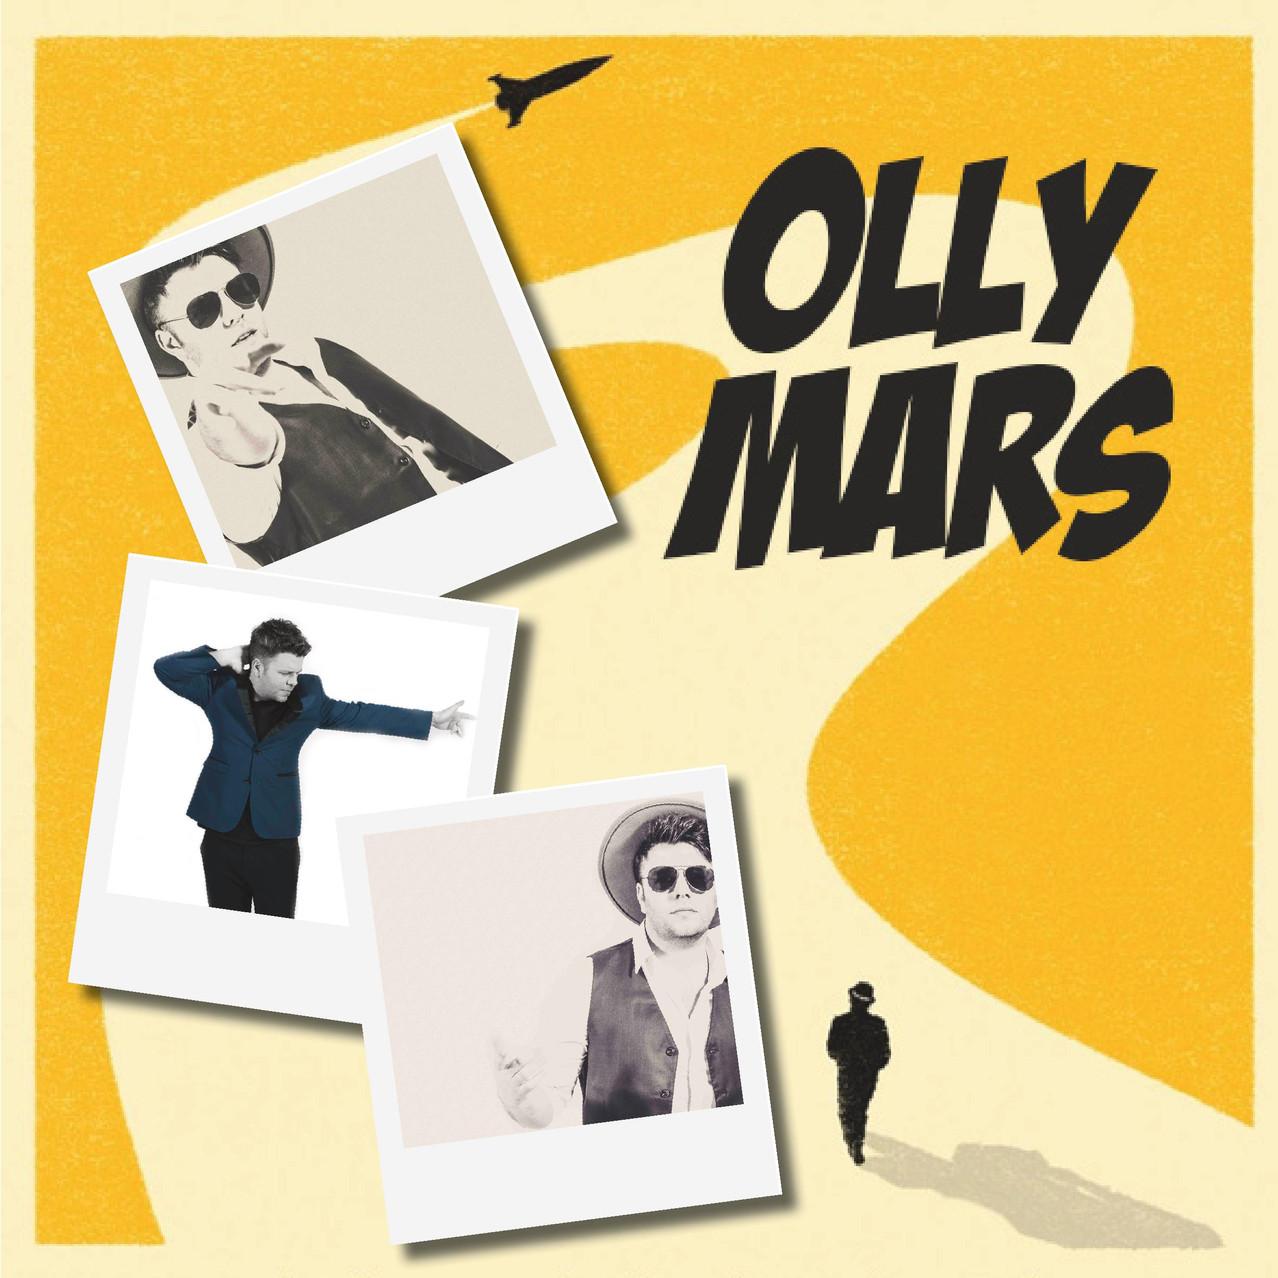 Olly Mars